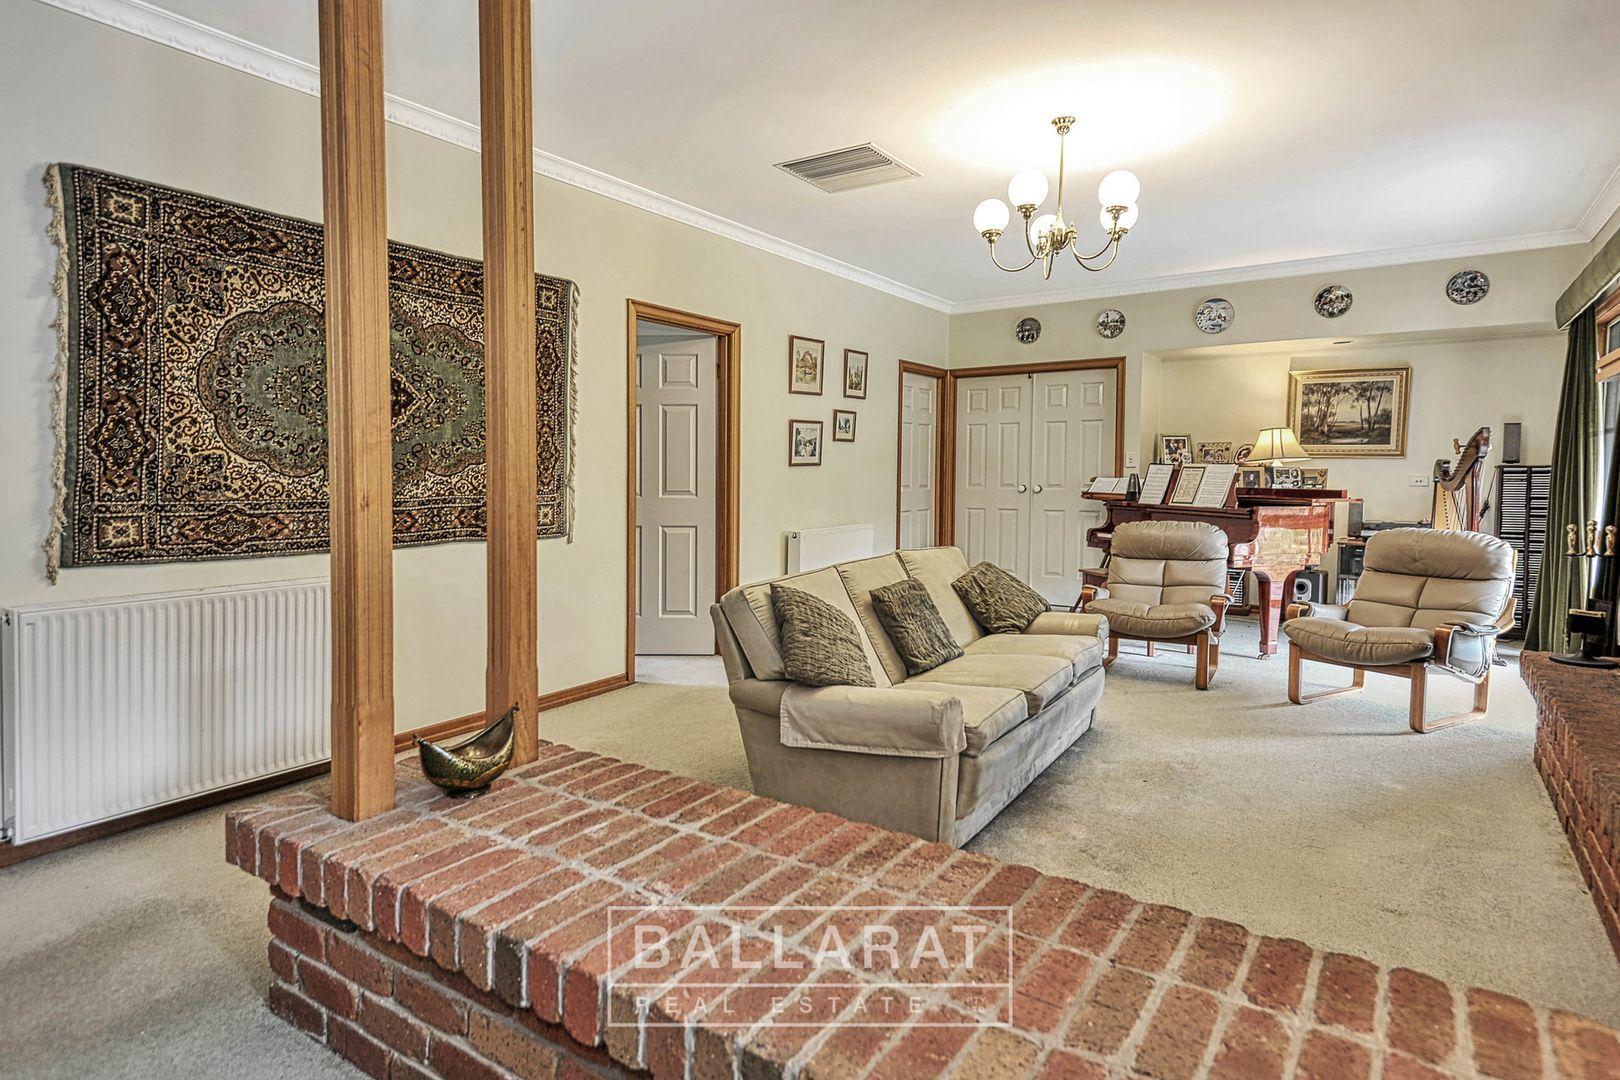 5770 Ballarat-Maryborough Road, Daisy Hill VIC 3465, Image 2